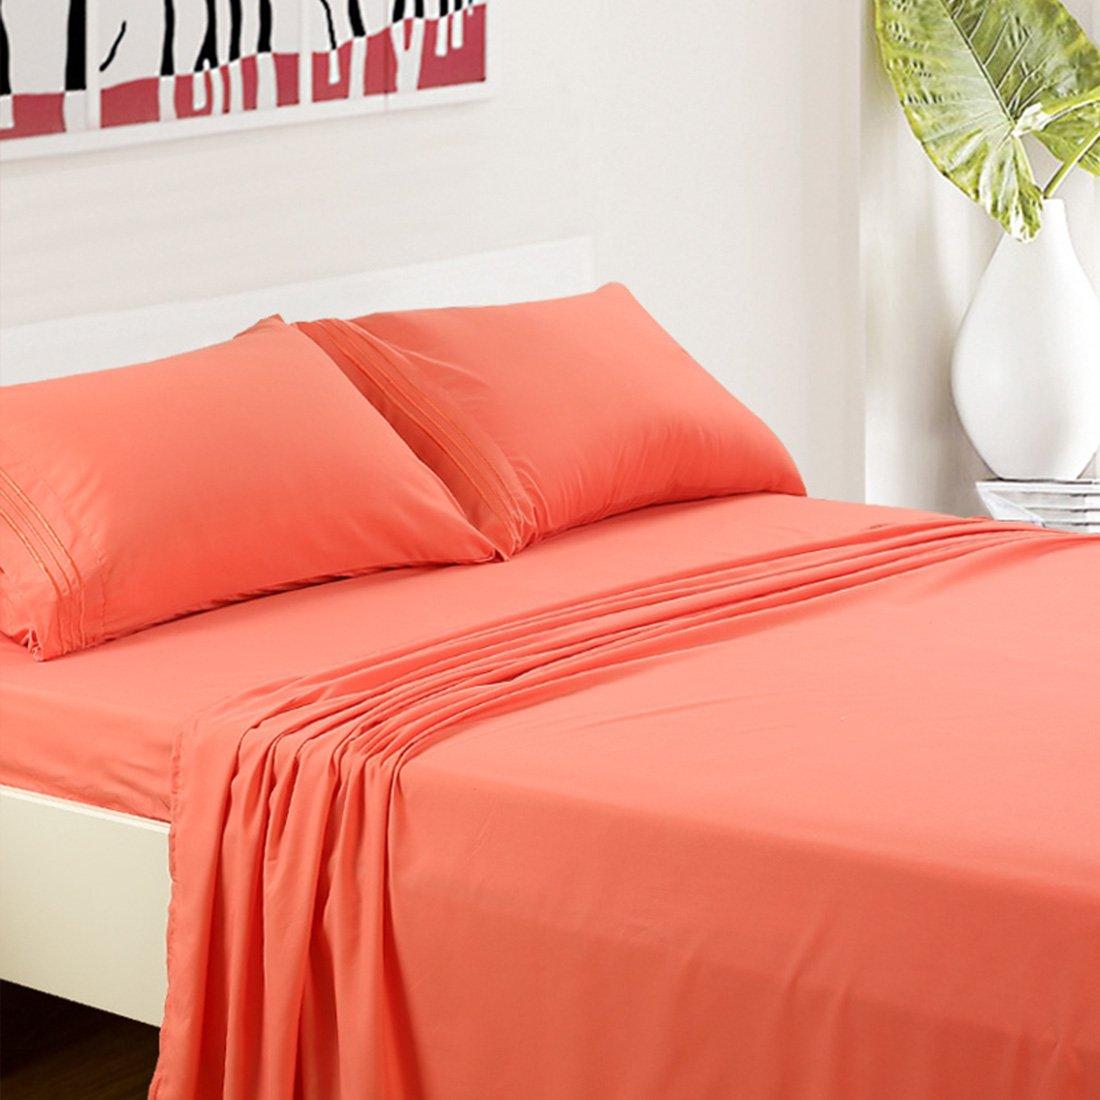 TasteLife 105 GSM Deep Pocket Bed Sheet Set 3 Piece Coral, Twin